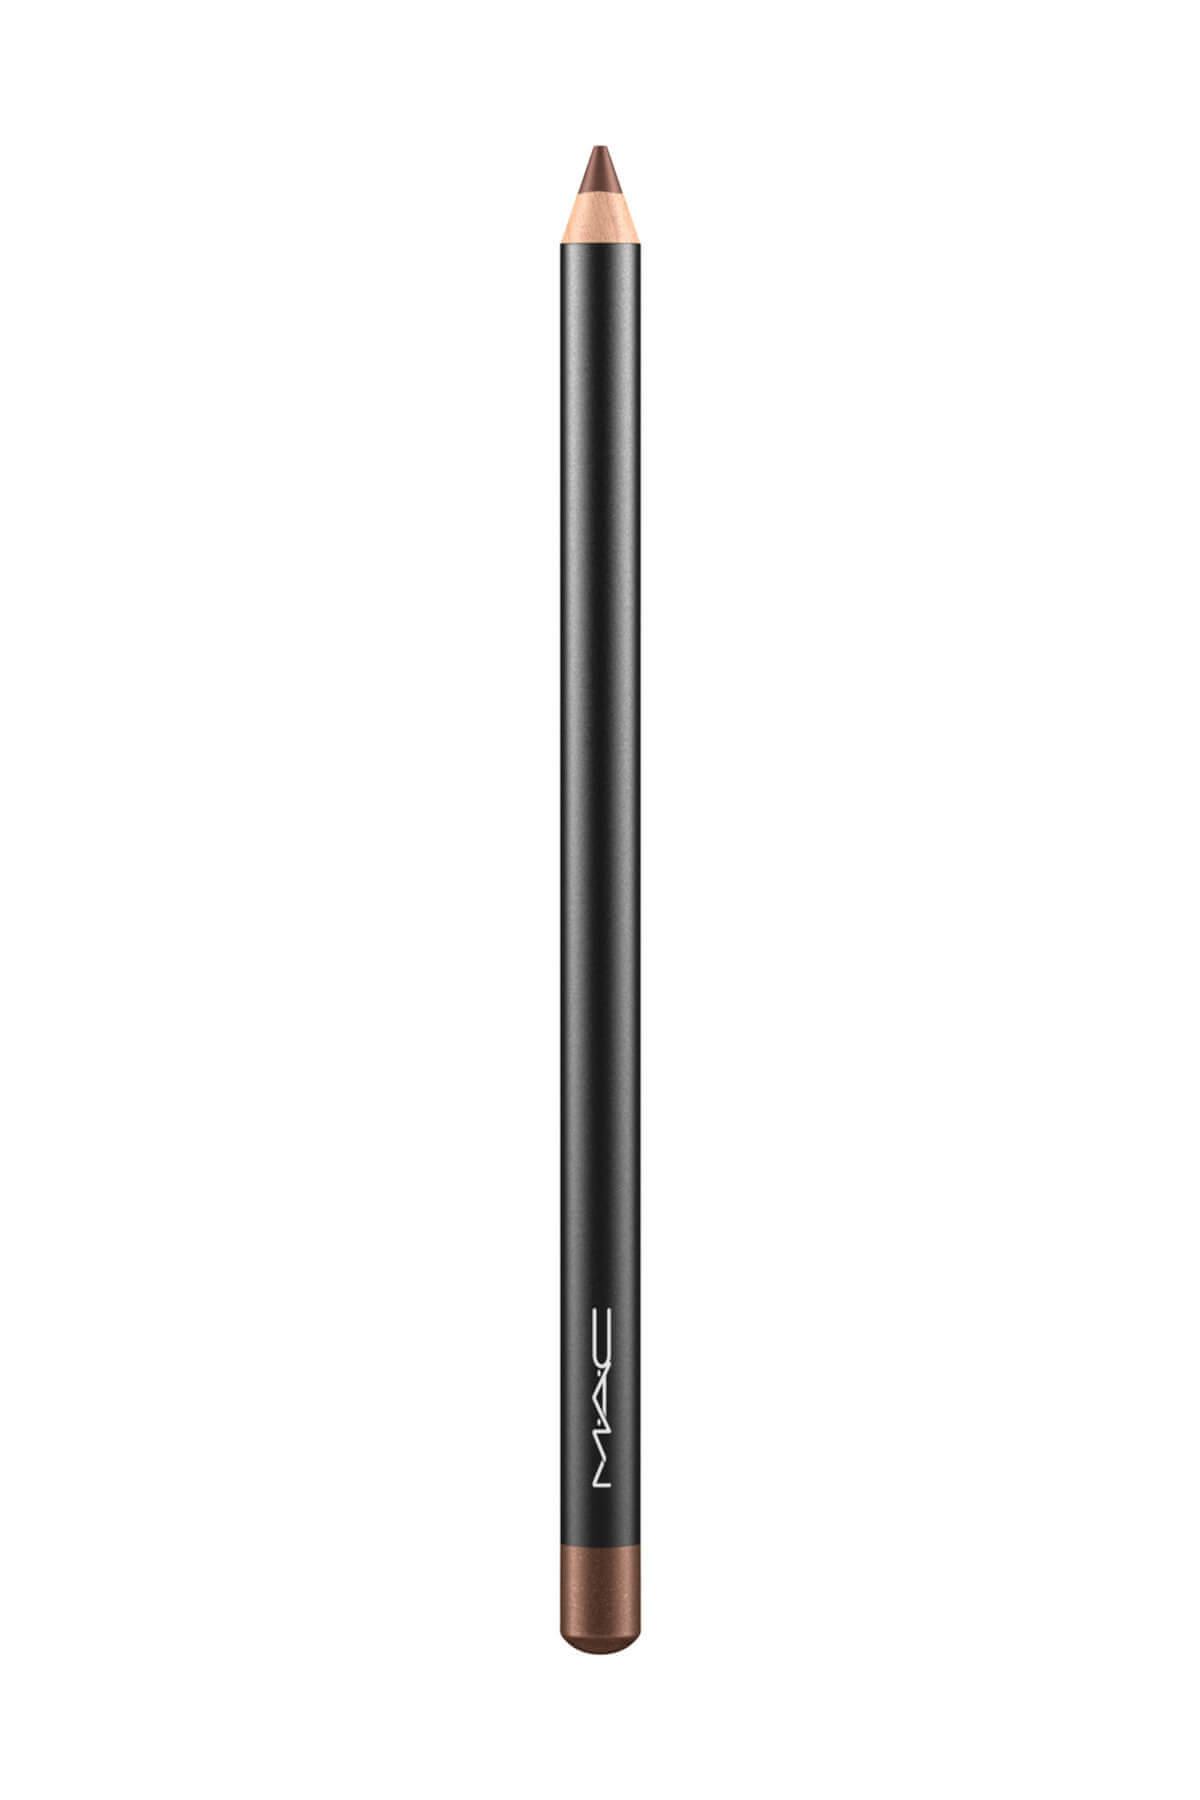 en güzel göz kalemi